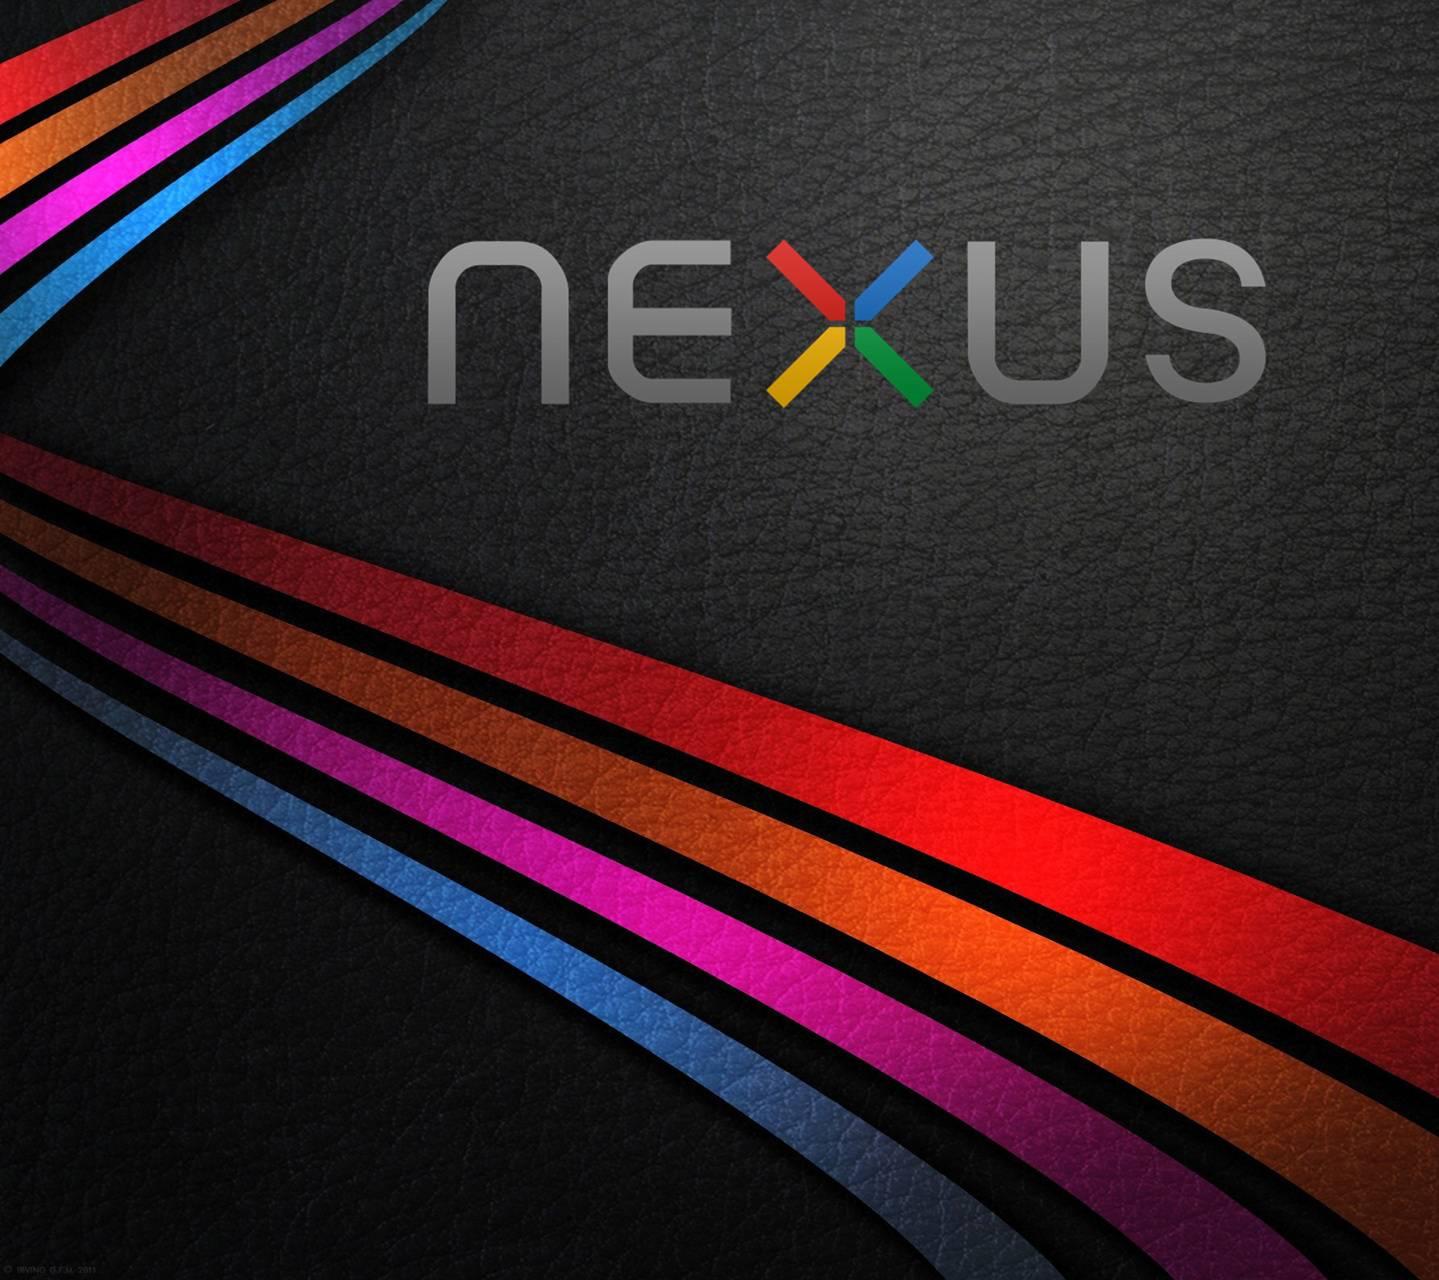 Galaxy Naxus Hd